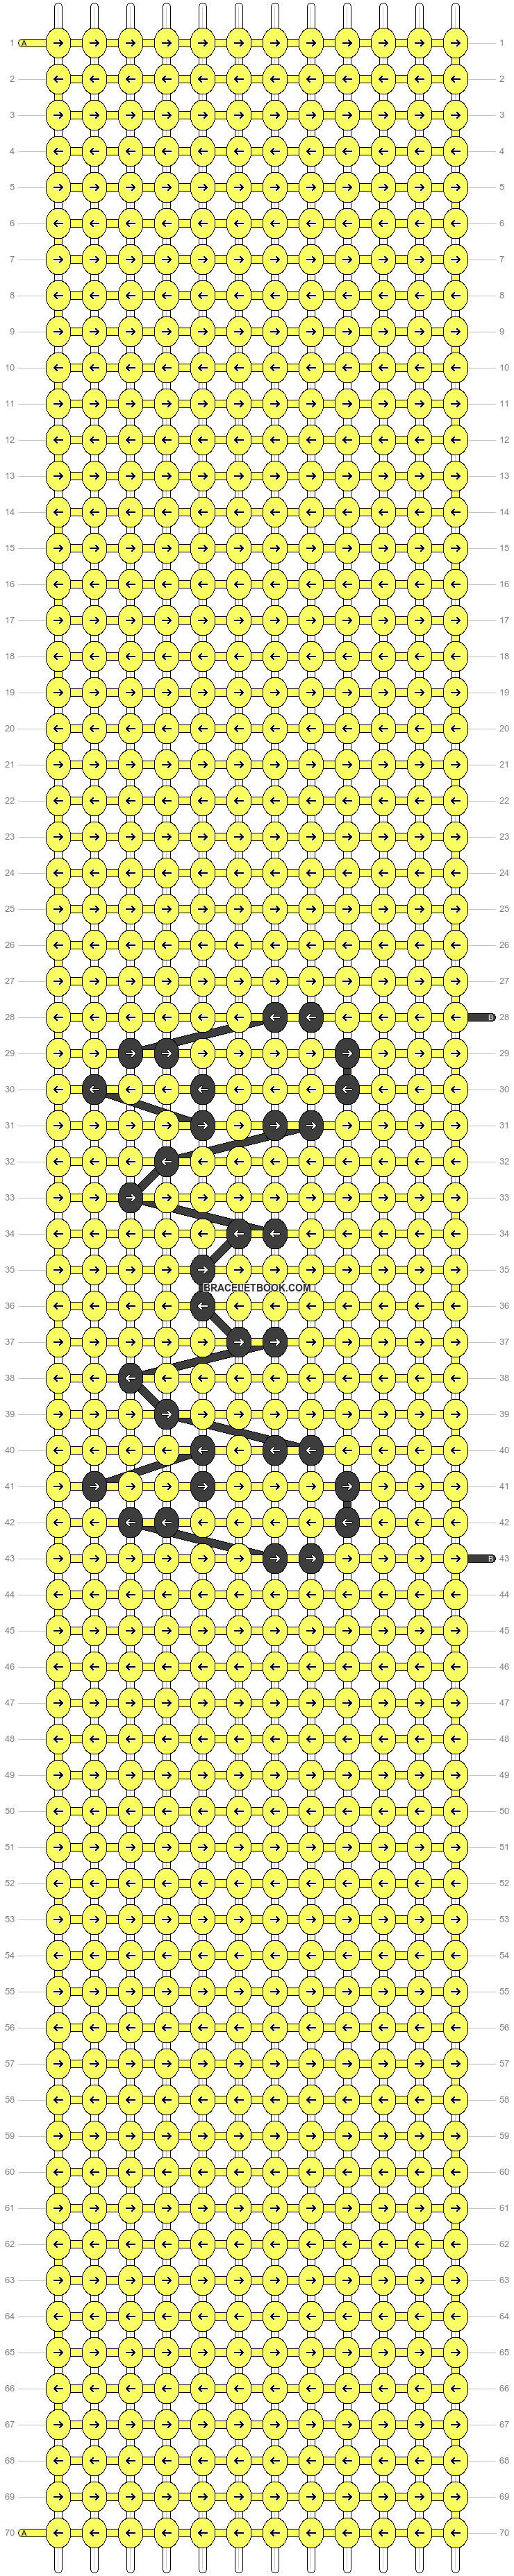 Alpha pattern #48188 pattern